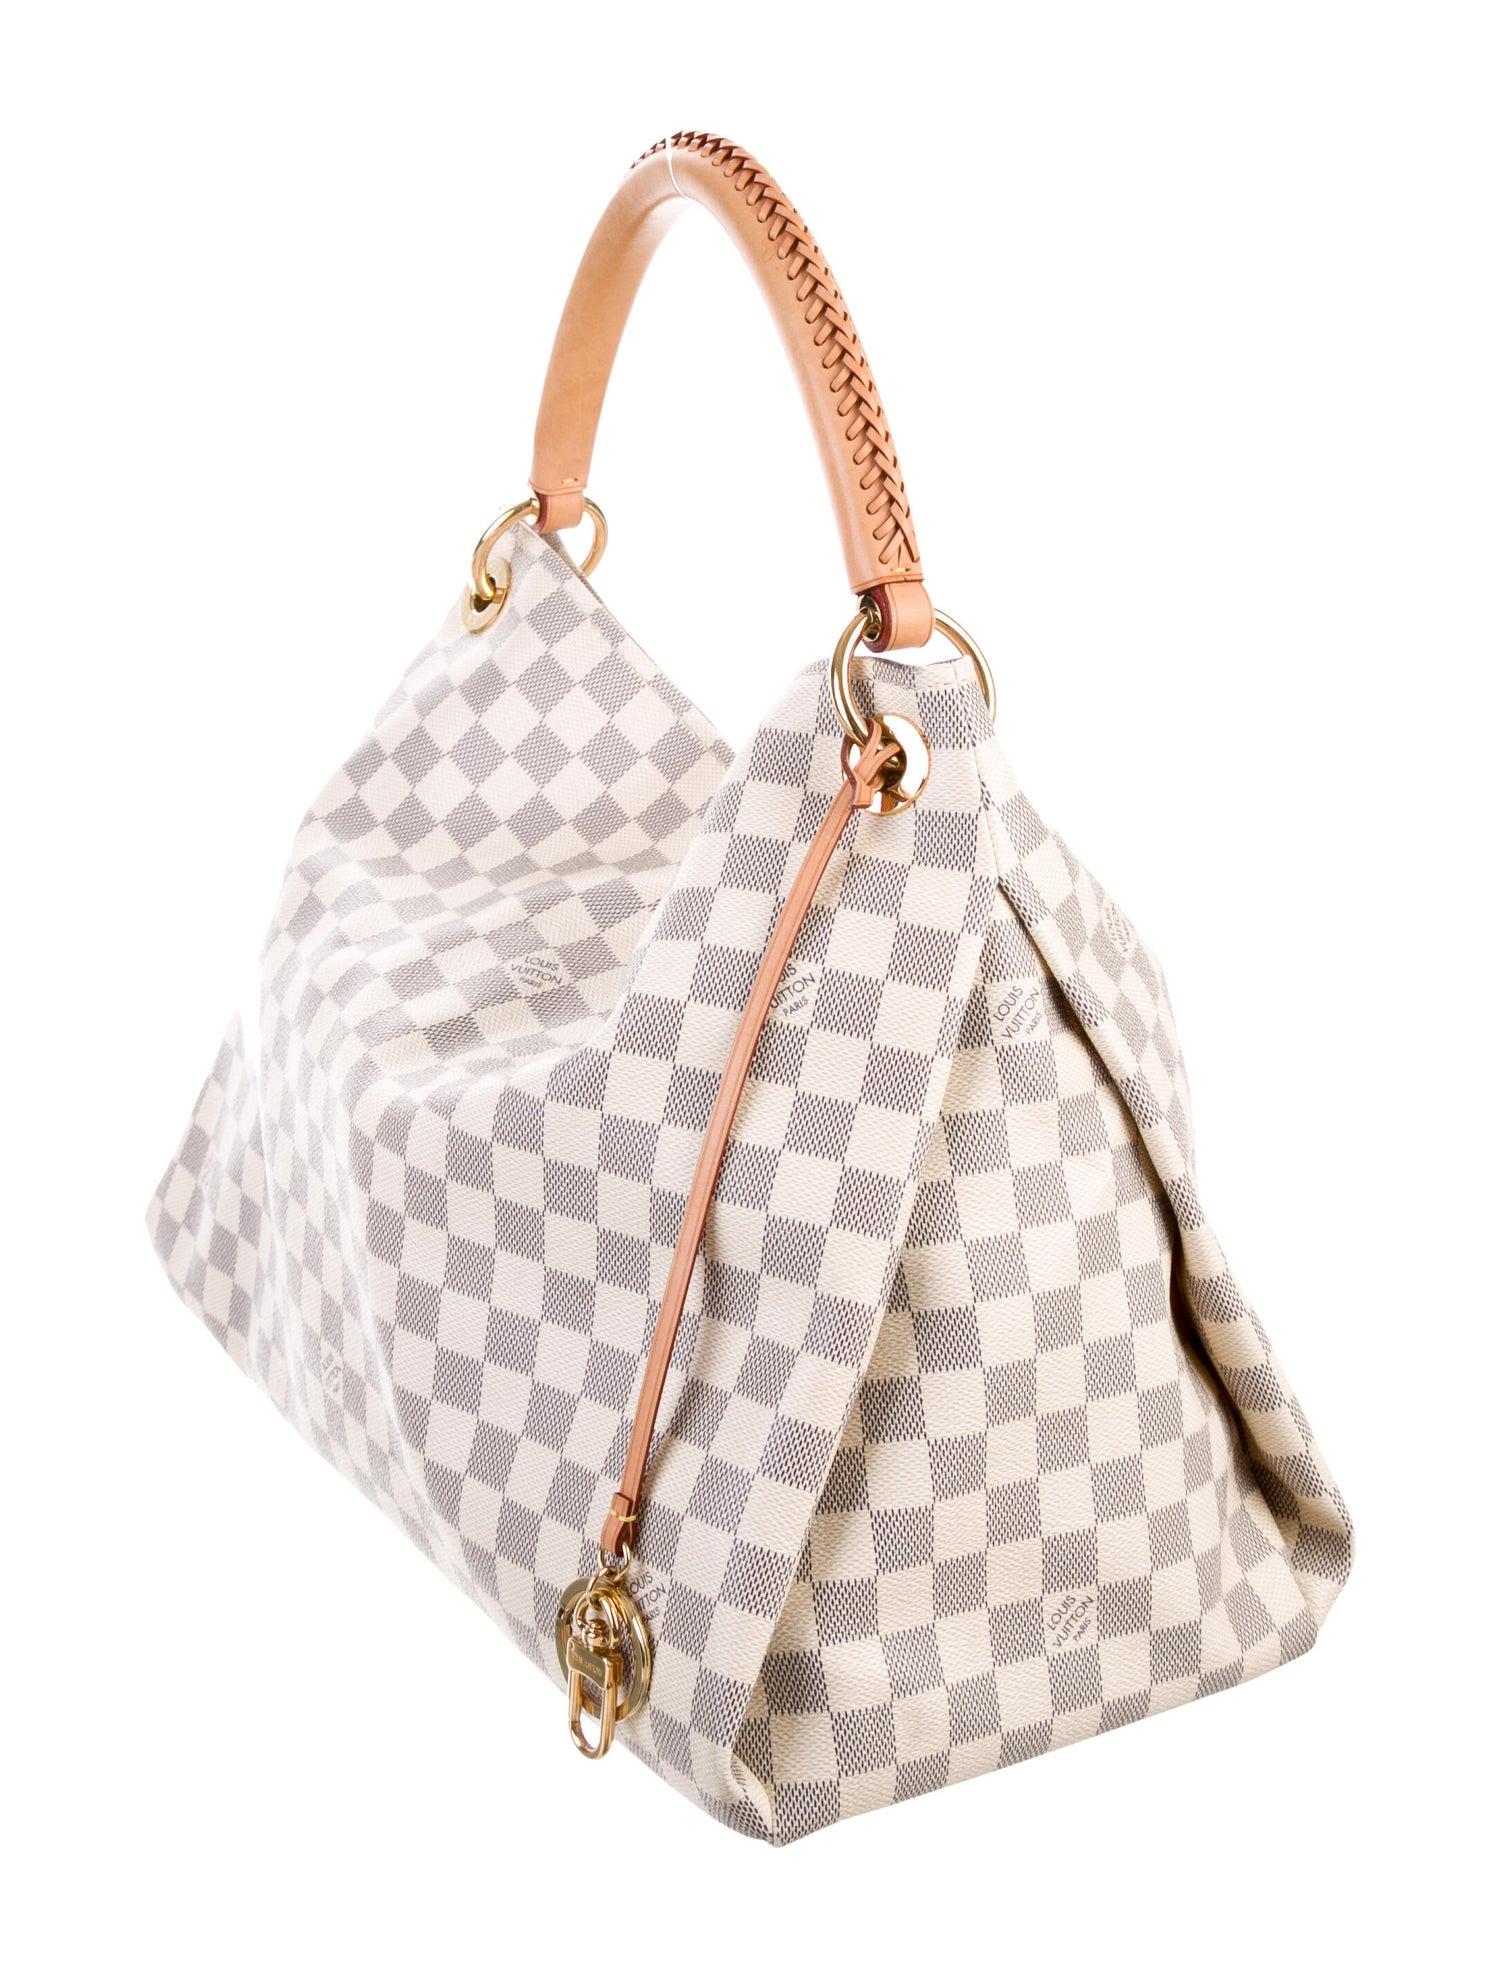 Louis-Vuitton-Artsy-MM-Damier-Azur_16199B.jpg